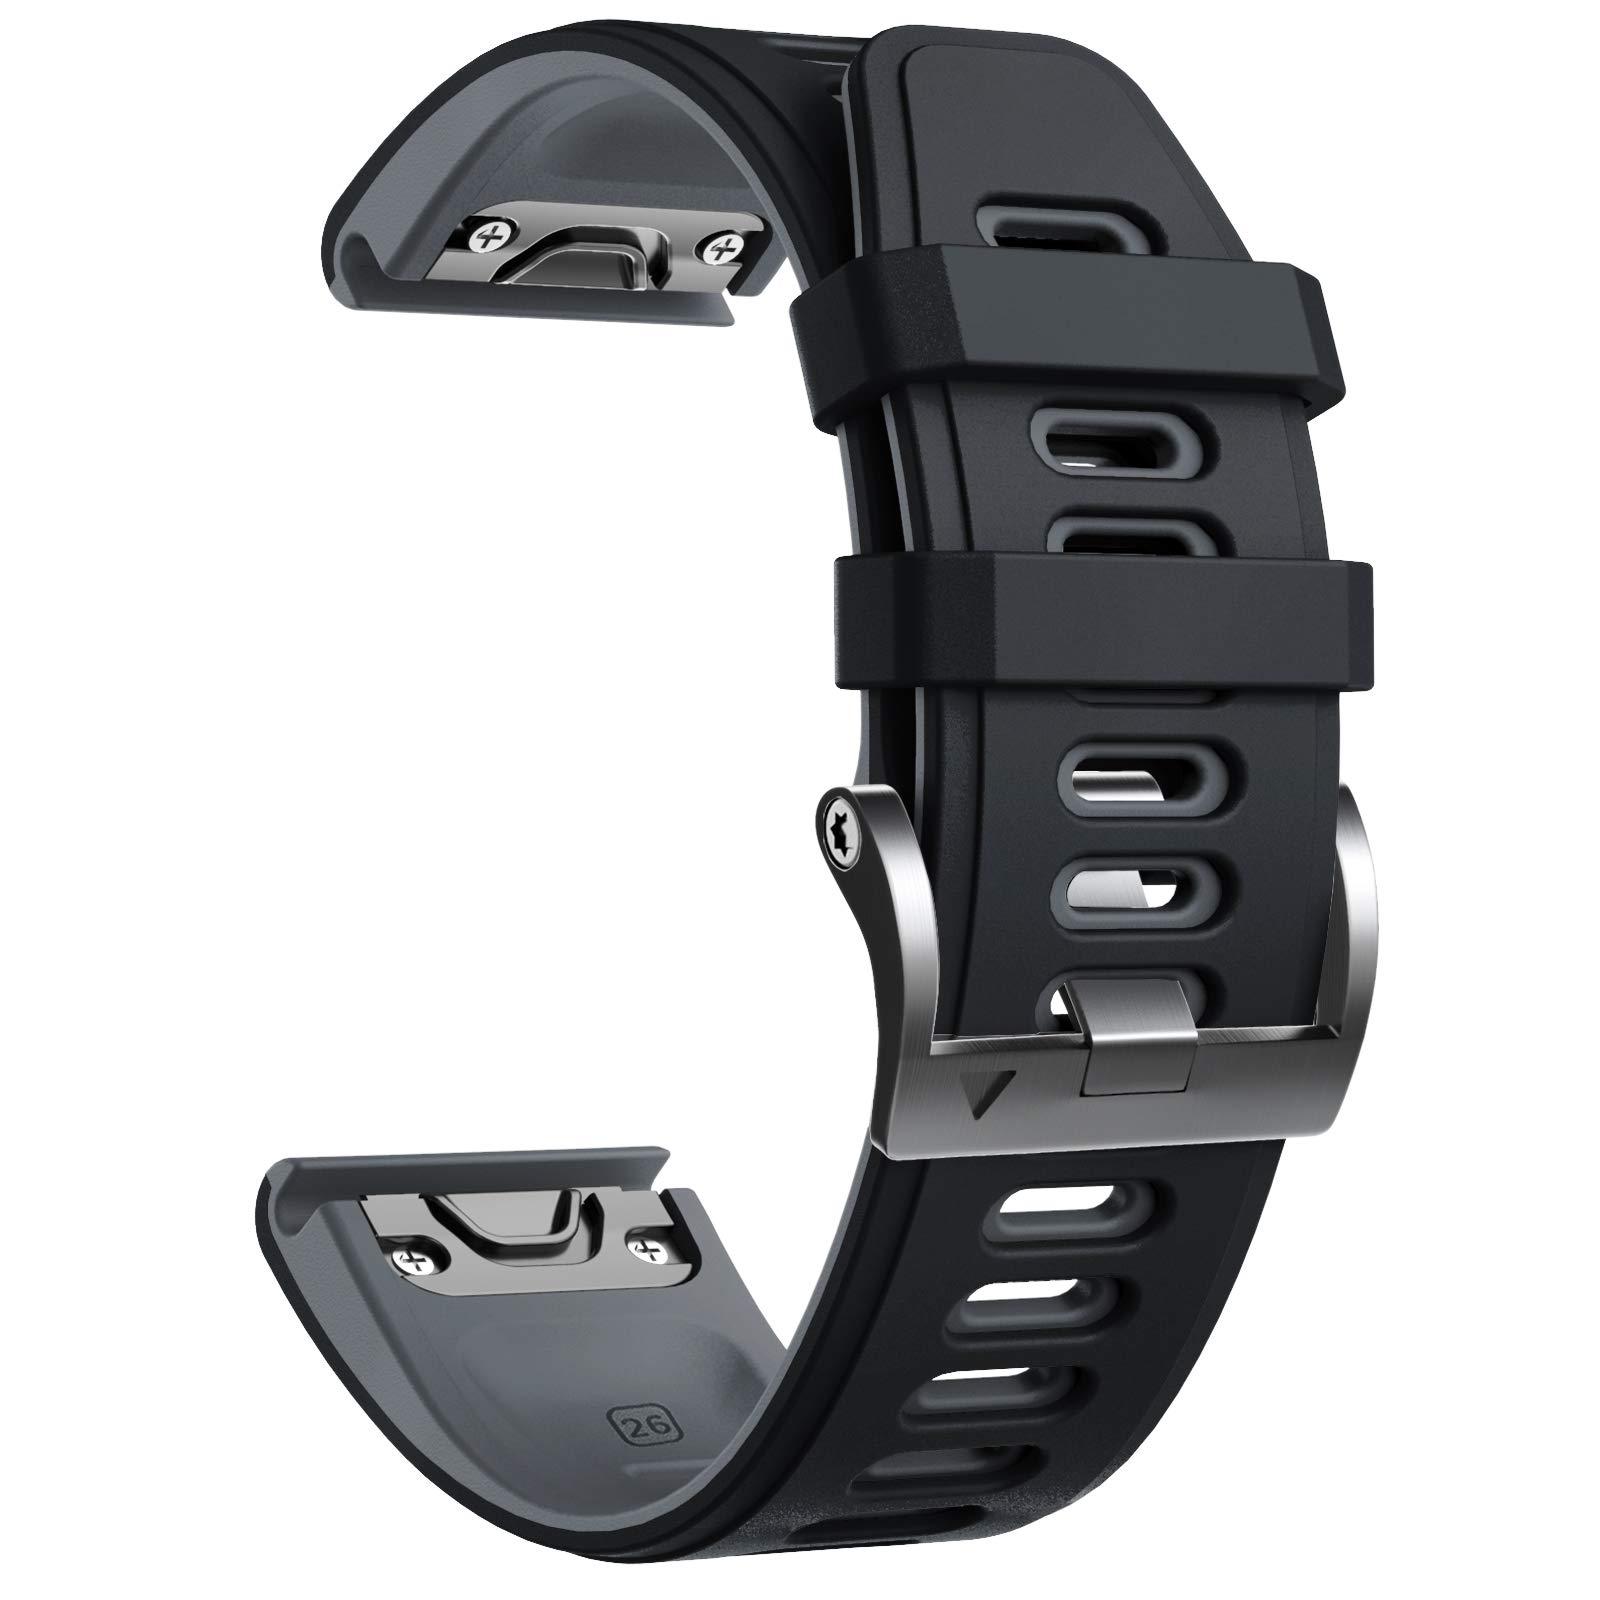 NotoCity Compatible with Fenix 6X Watchbands Silicone Sport Watch Strap for Fenix 5X/5X Plus/Fenix 6X/Fenix 6X Pro/Fenix 3/Fenix 3 HR/Descent MK1/D2 Delta PX/D2 Charlie Smartwatch. (Black-Grey)